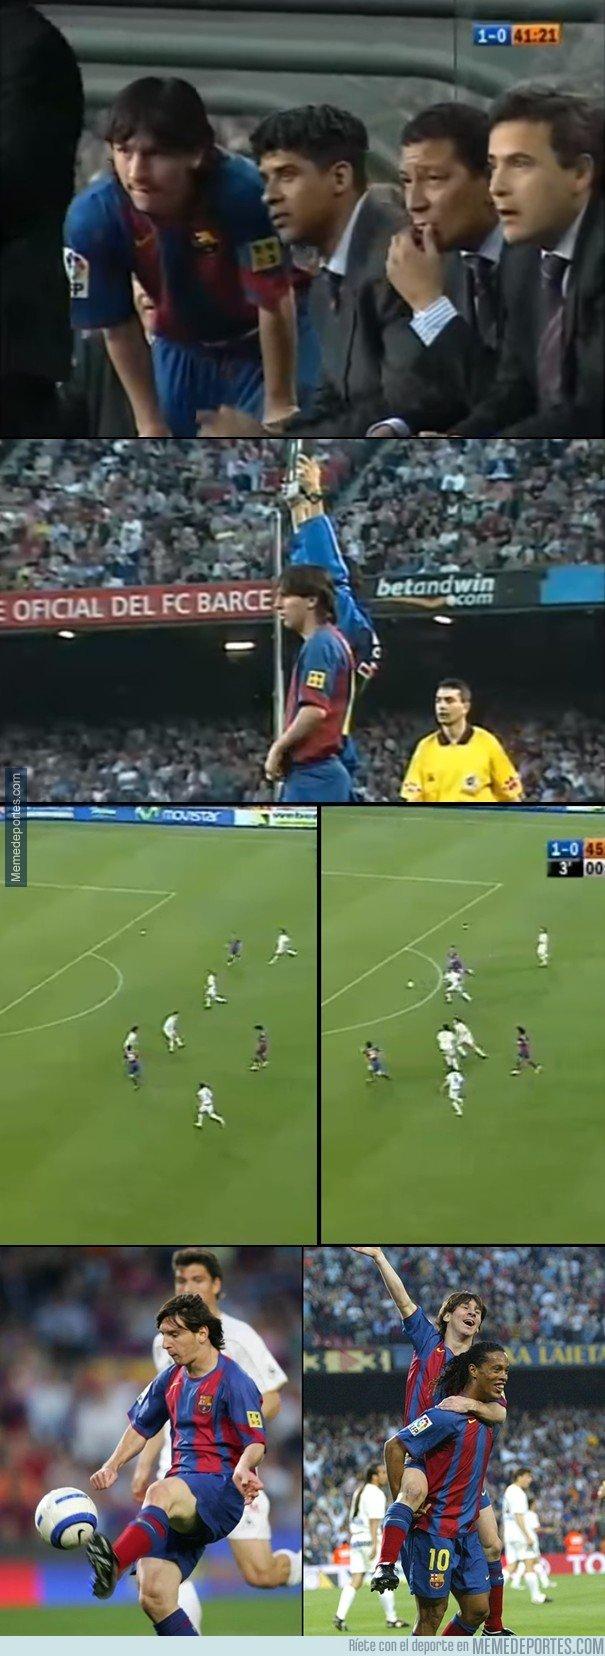 1032333 - El primer gol de Messi cumple hoy 13 años